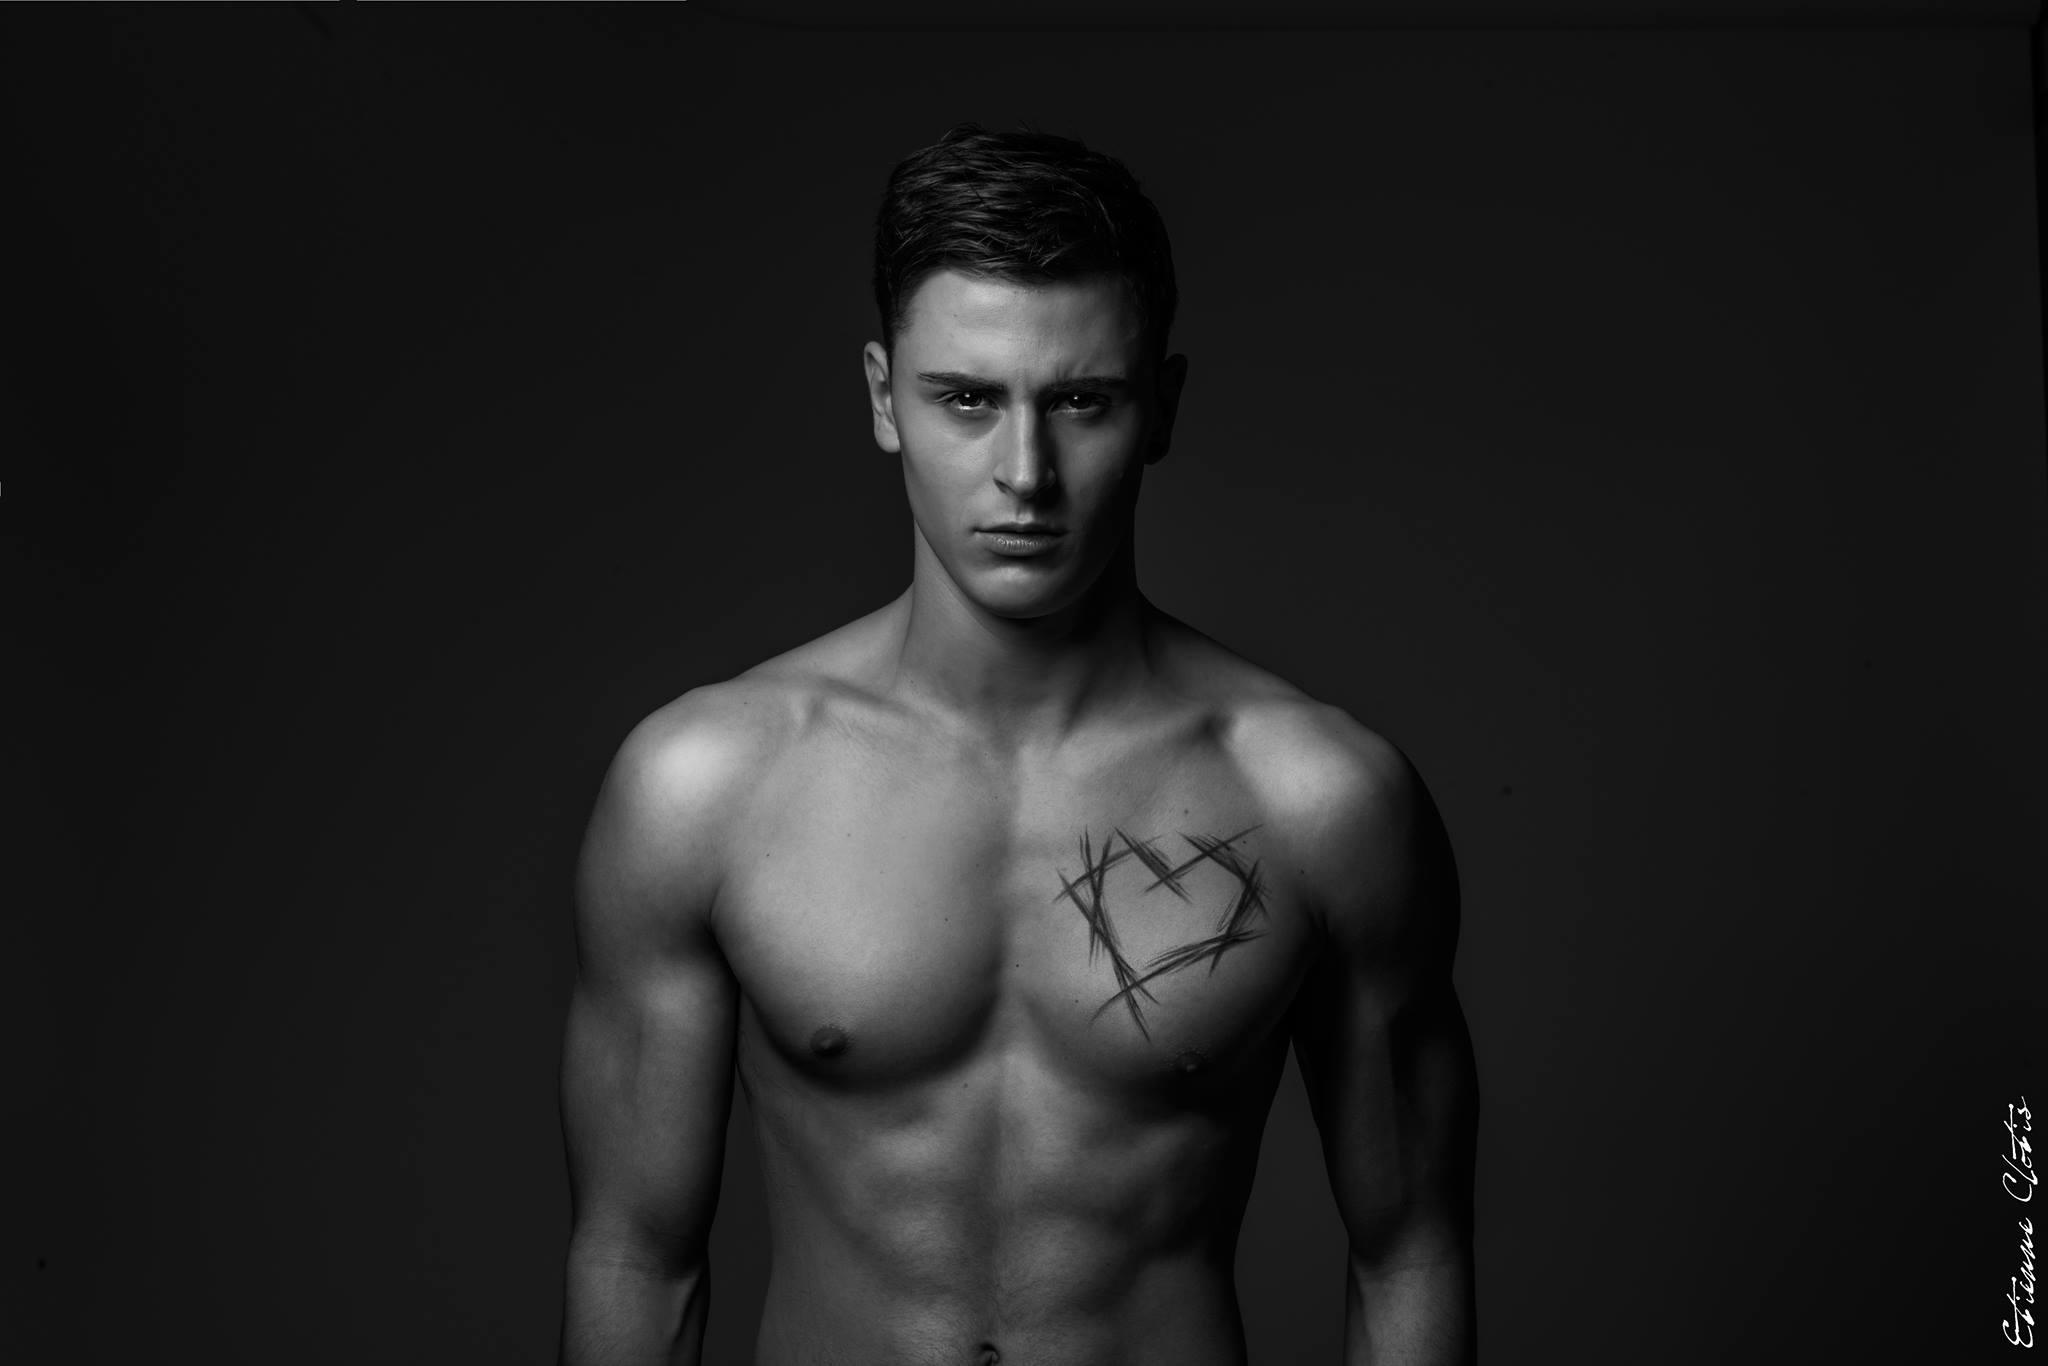 Escort sud foto maschi nudi gay